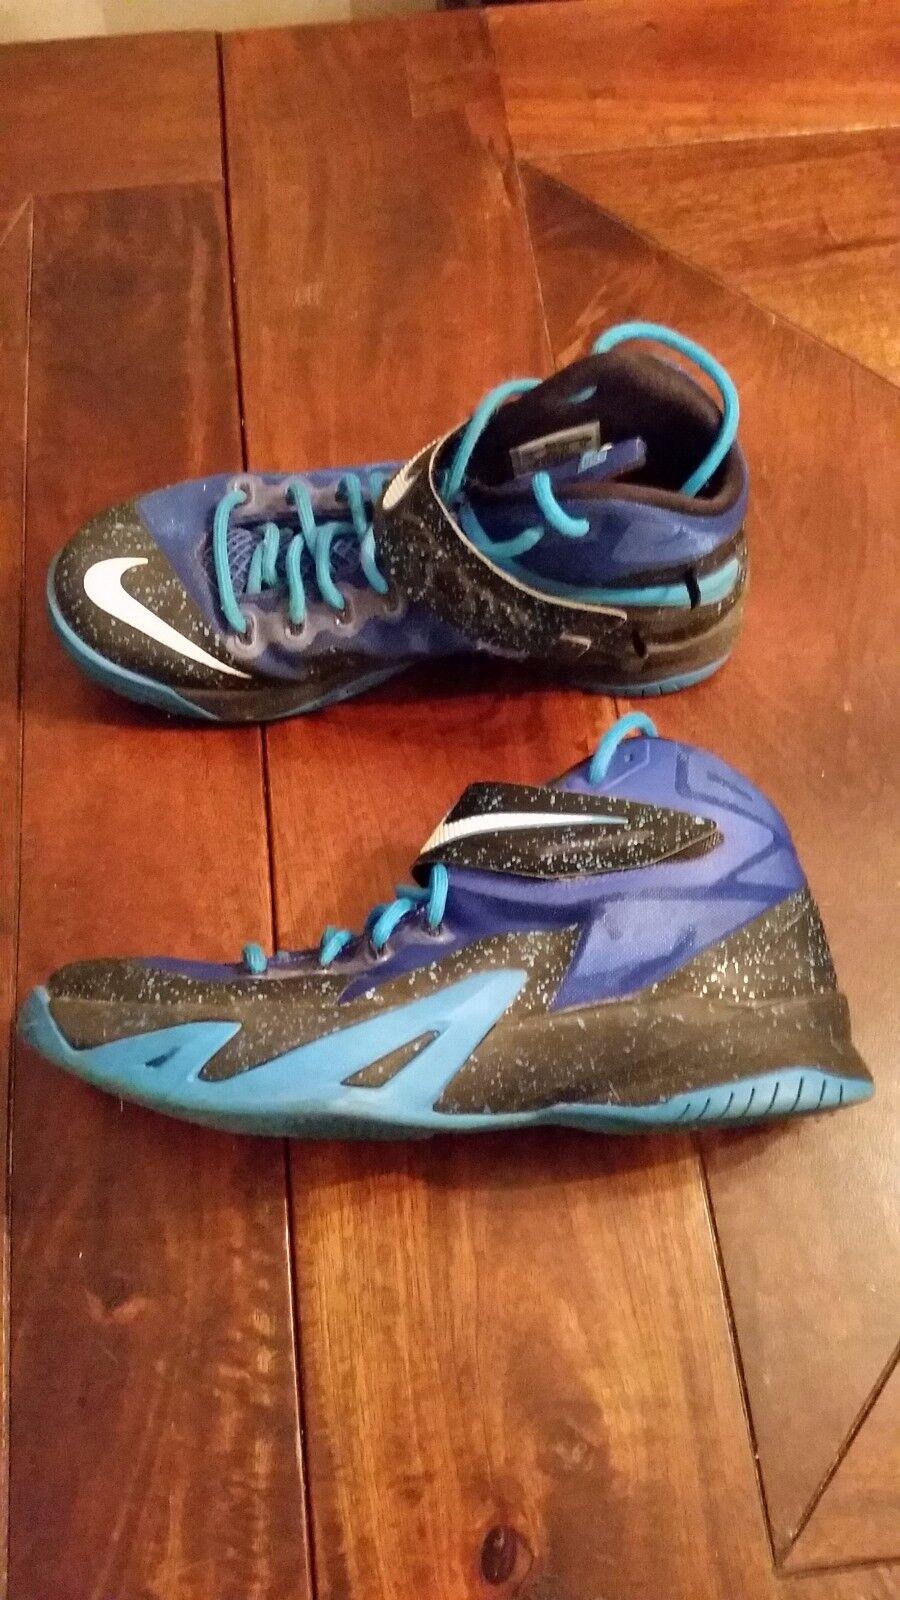 Comfortable and good-looking Nike Lebron Soldier 8 Men's Basketball sneaker Blue/Black EUC